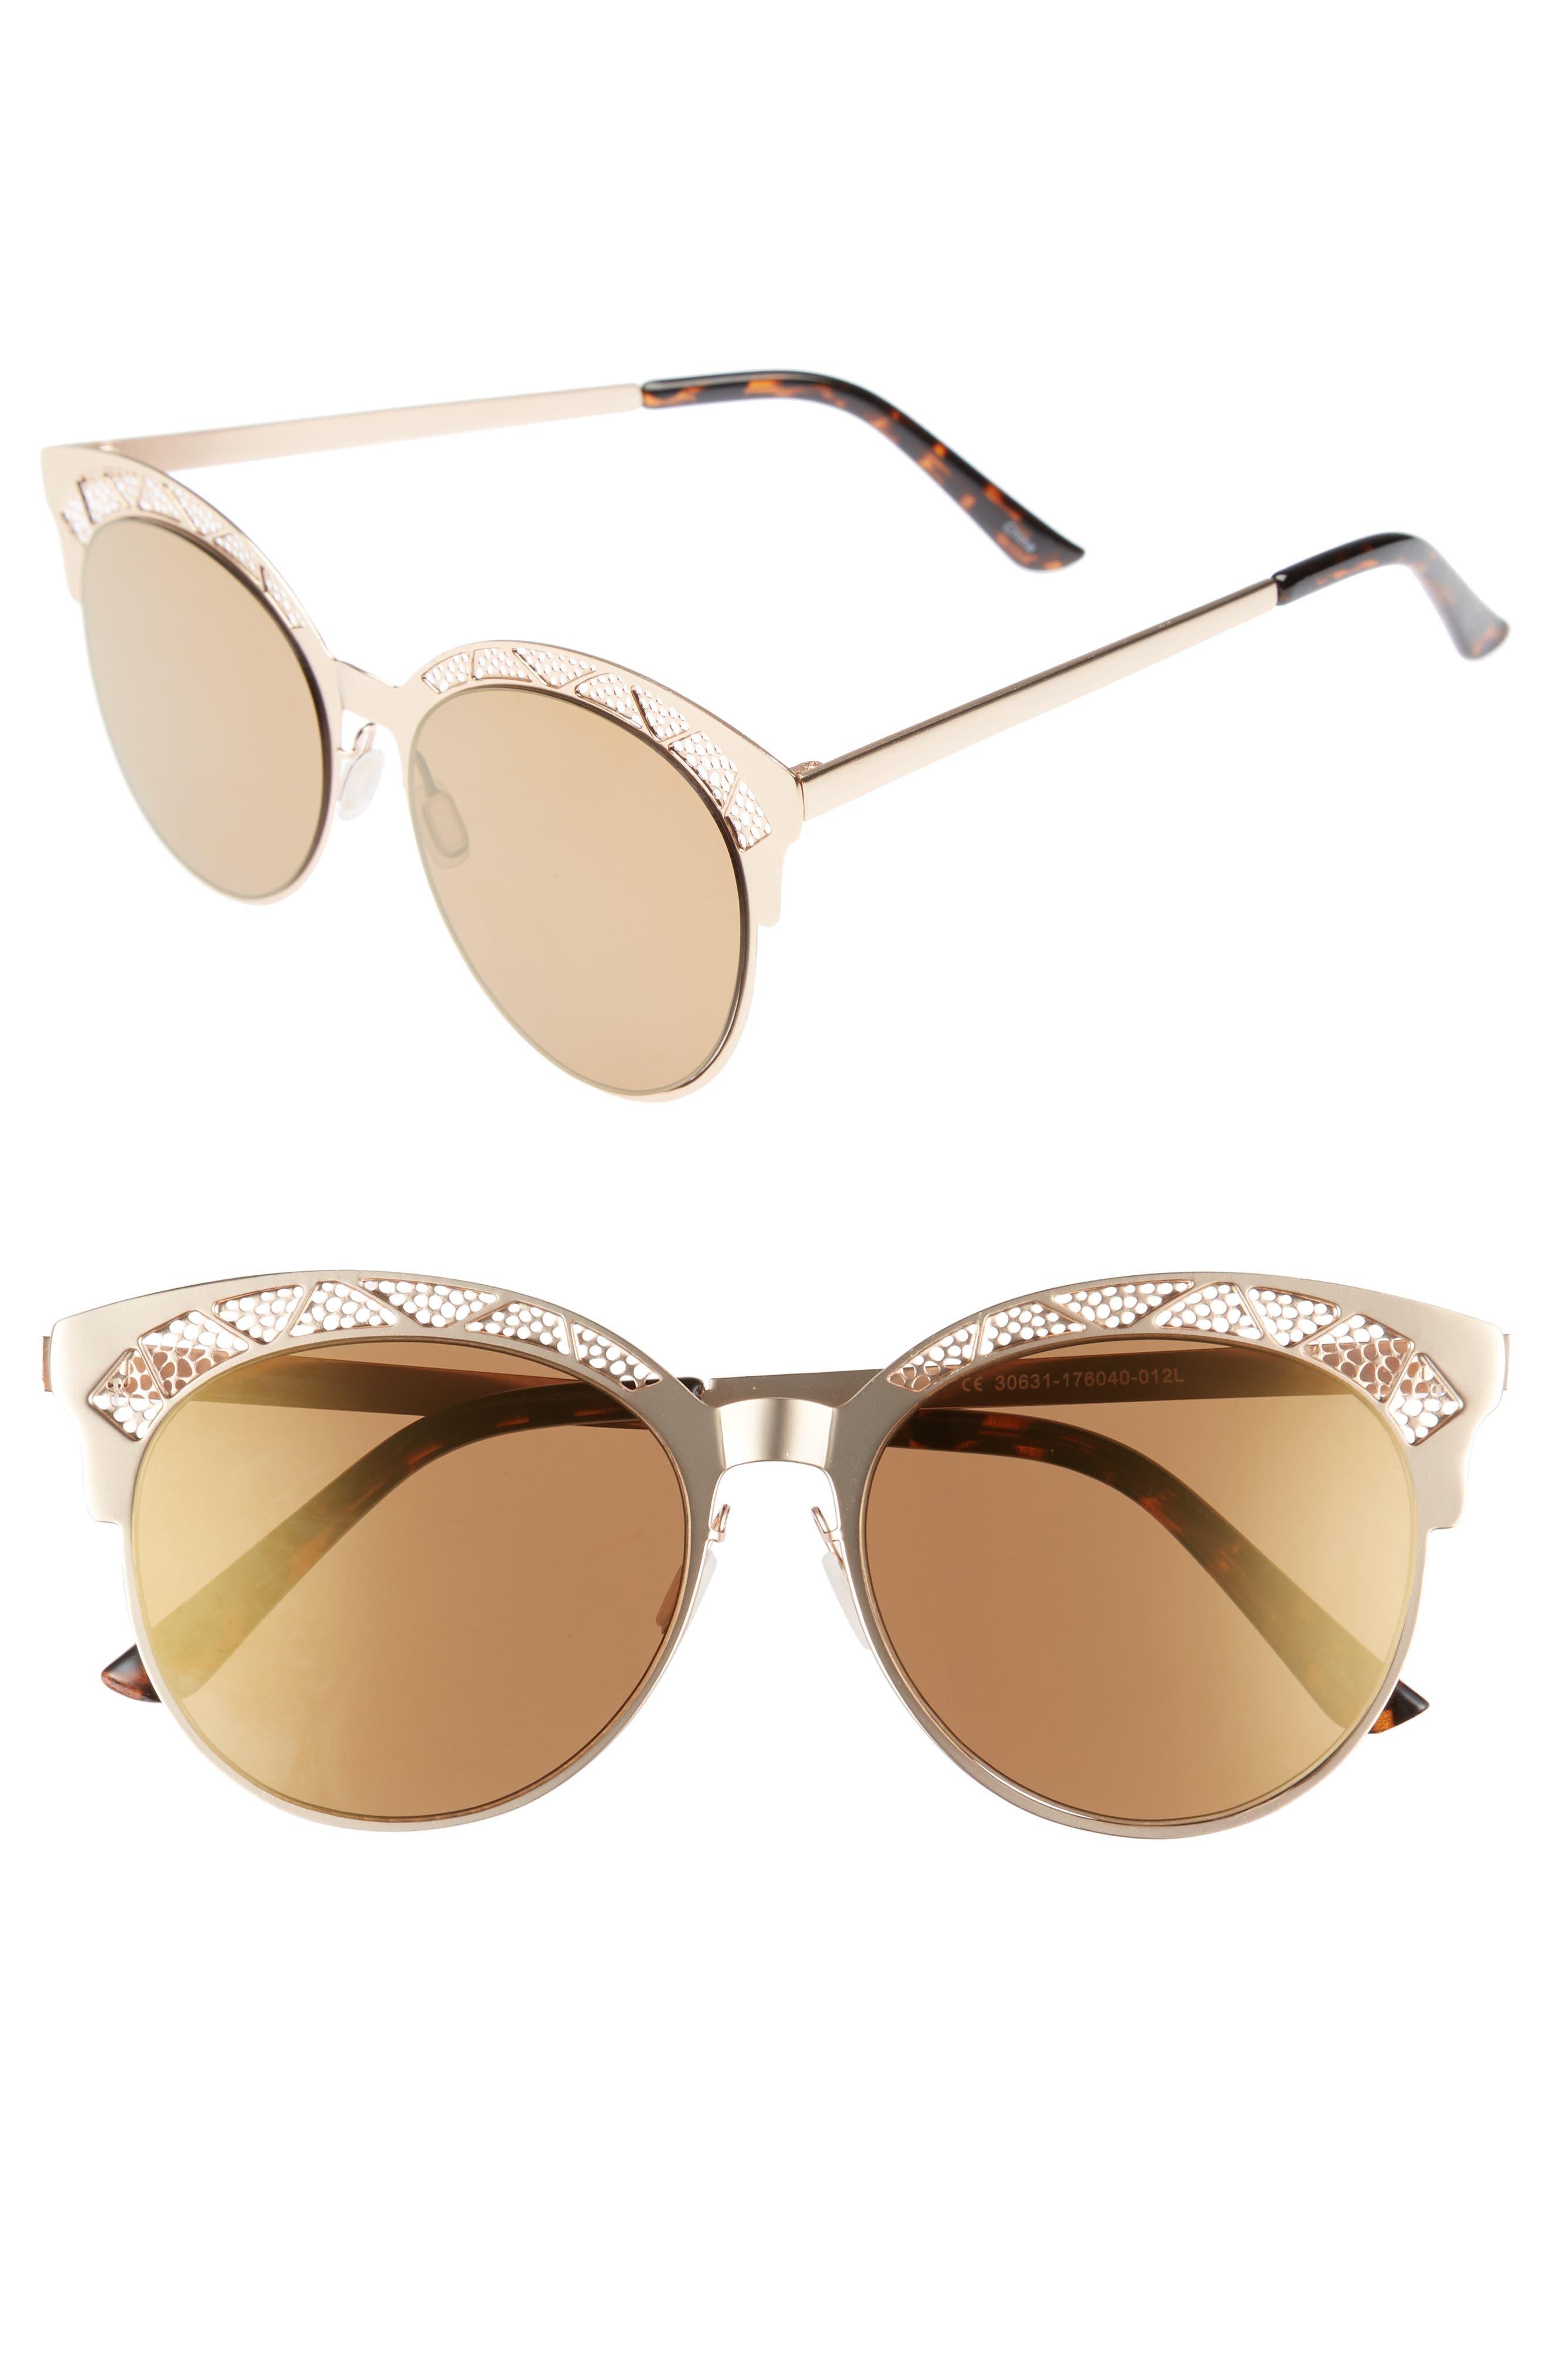 56mm Round Sunglasses,                             Main thumbnail 1, color,                             710